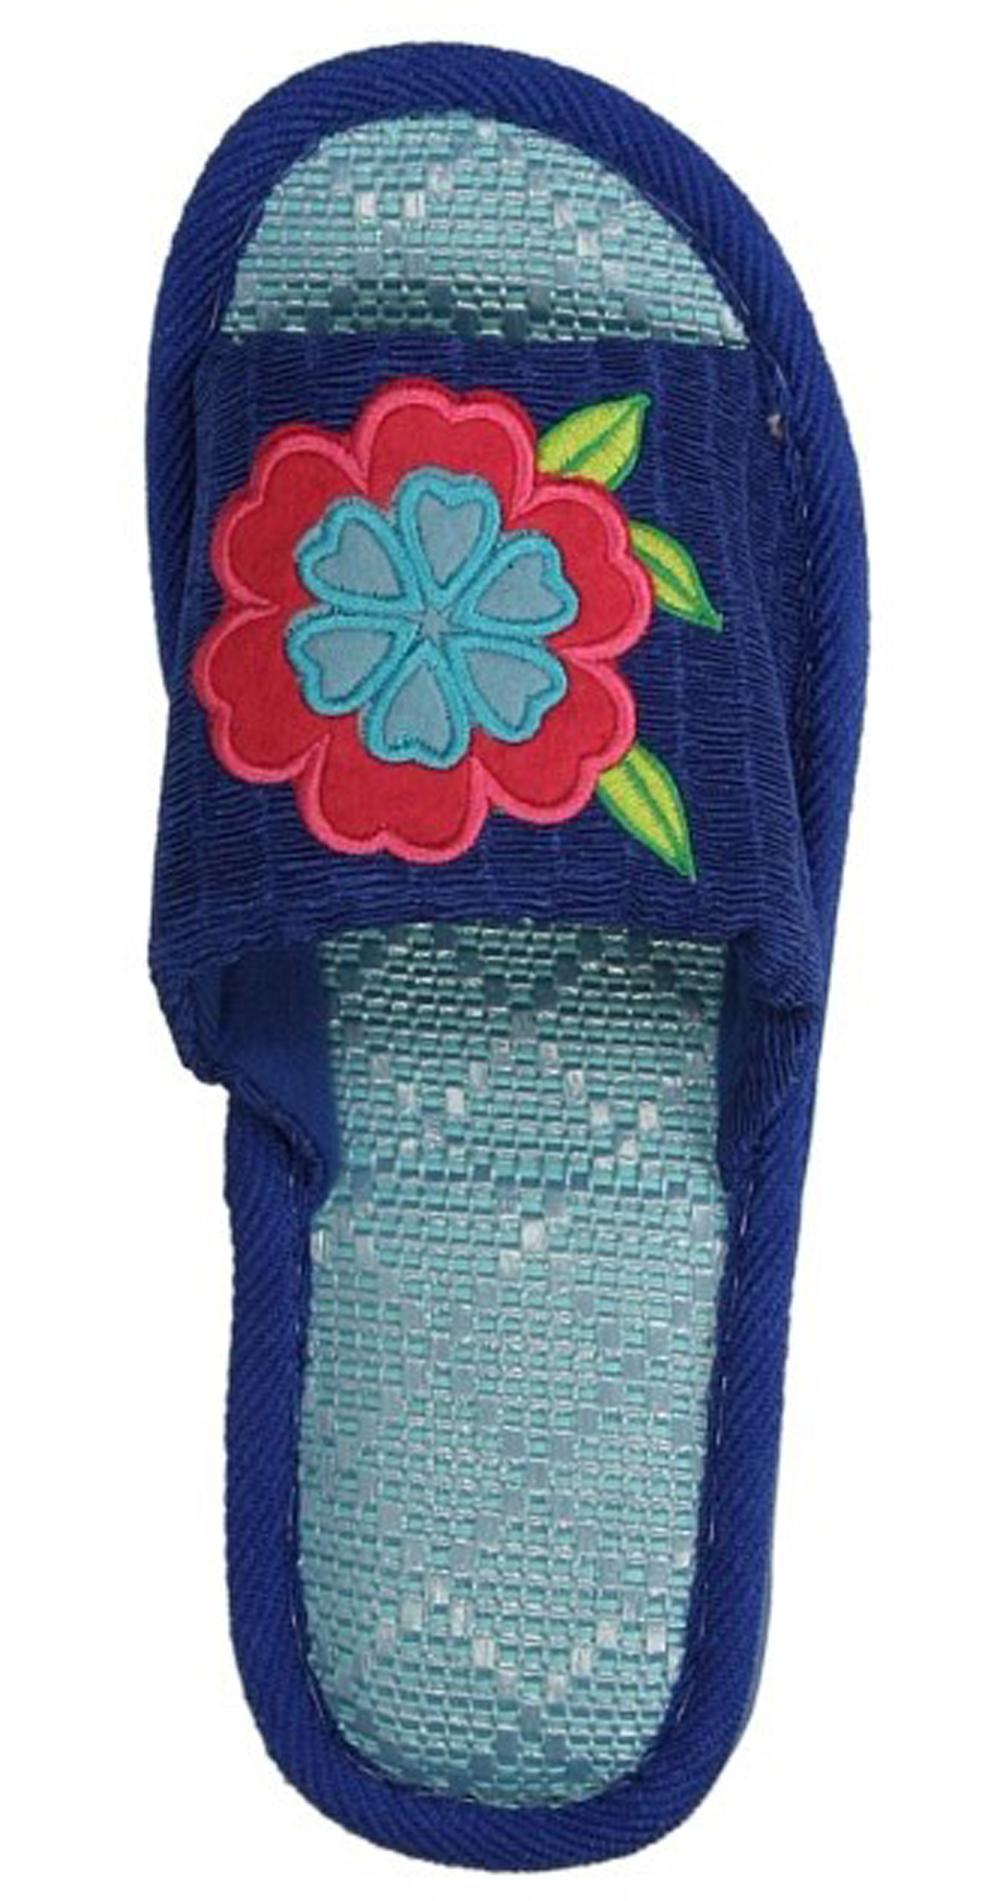 OBUWIE CASU DOMOWE1362 kolor niebieski